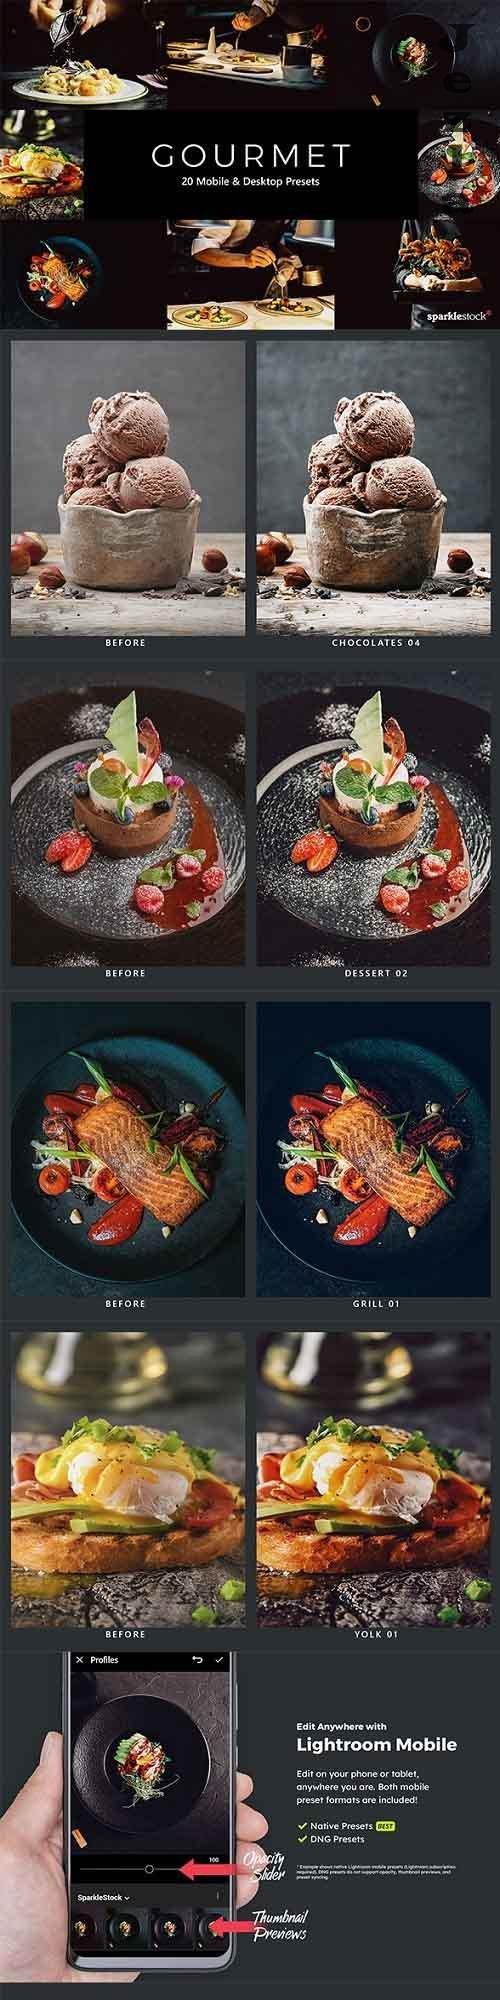 20 Gourmet Lightroom Presets & LUTs - 28618215 - 5410360